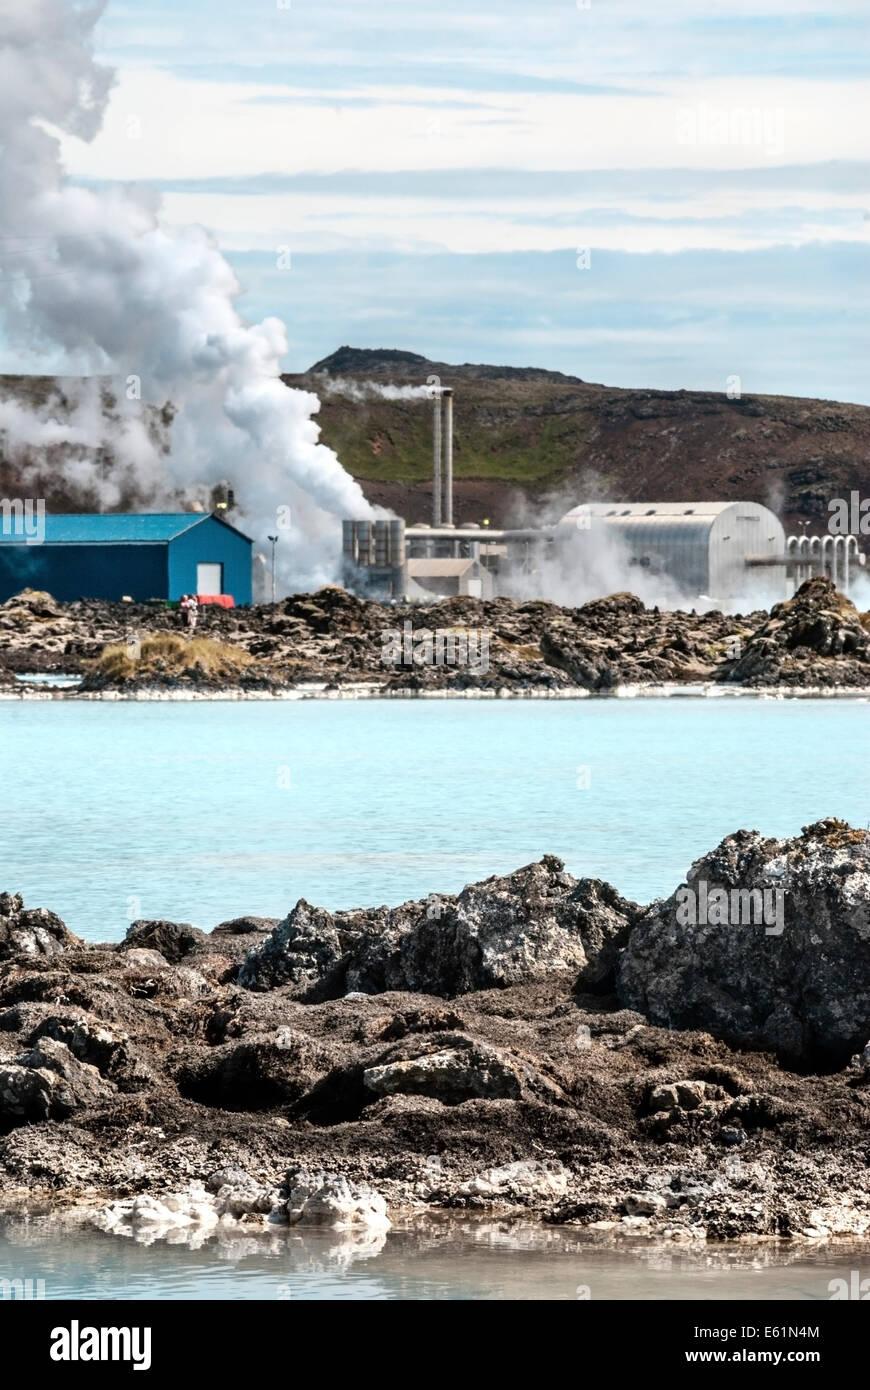 Geothermal power station at the Blue Lagoon, Iceland.   Geothermiekraftwerk an der Blauen Lagune, Island. - Stock Image